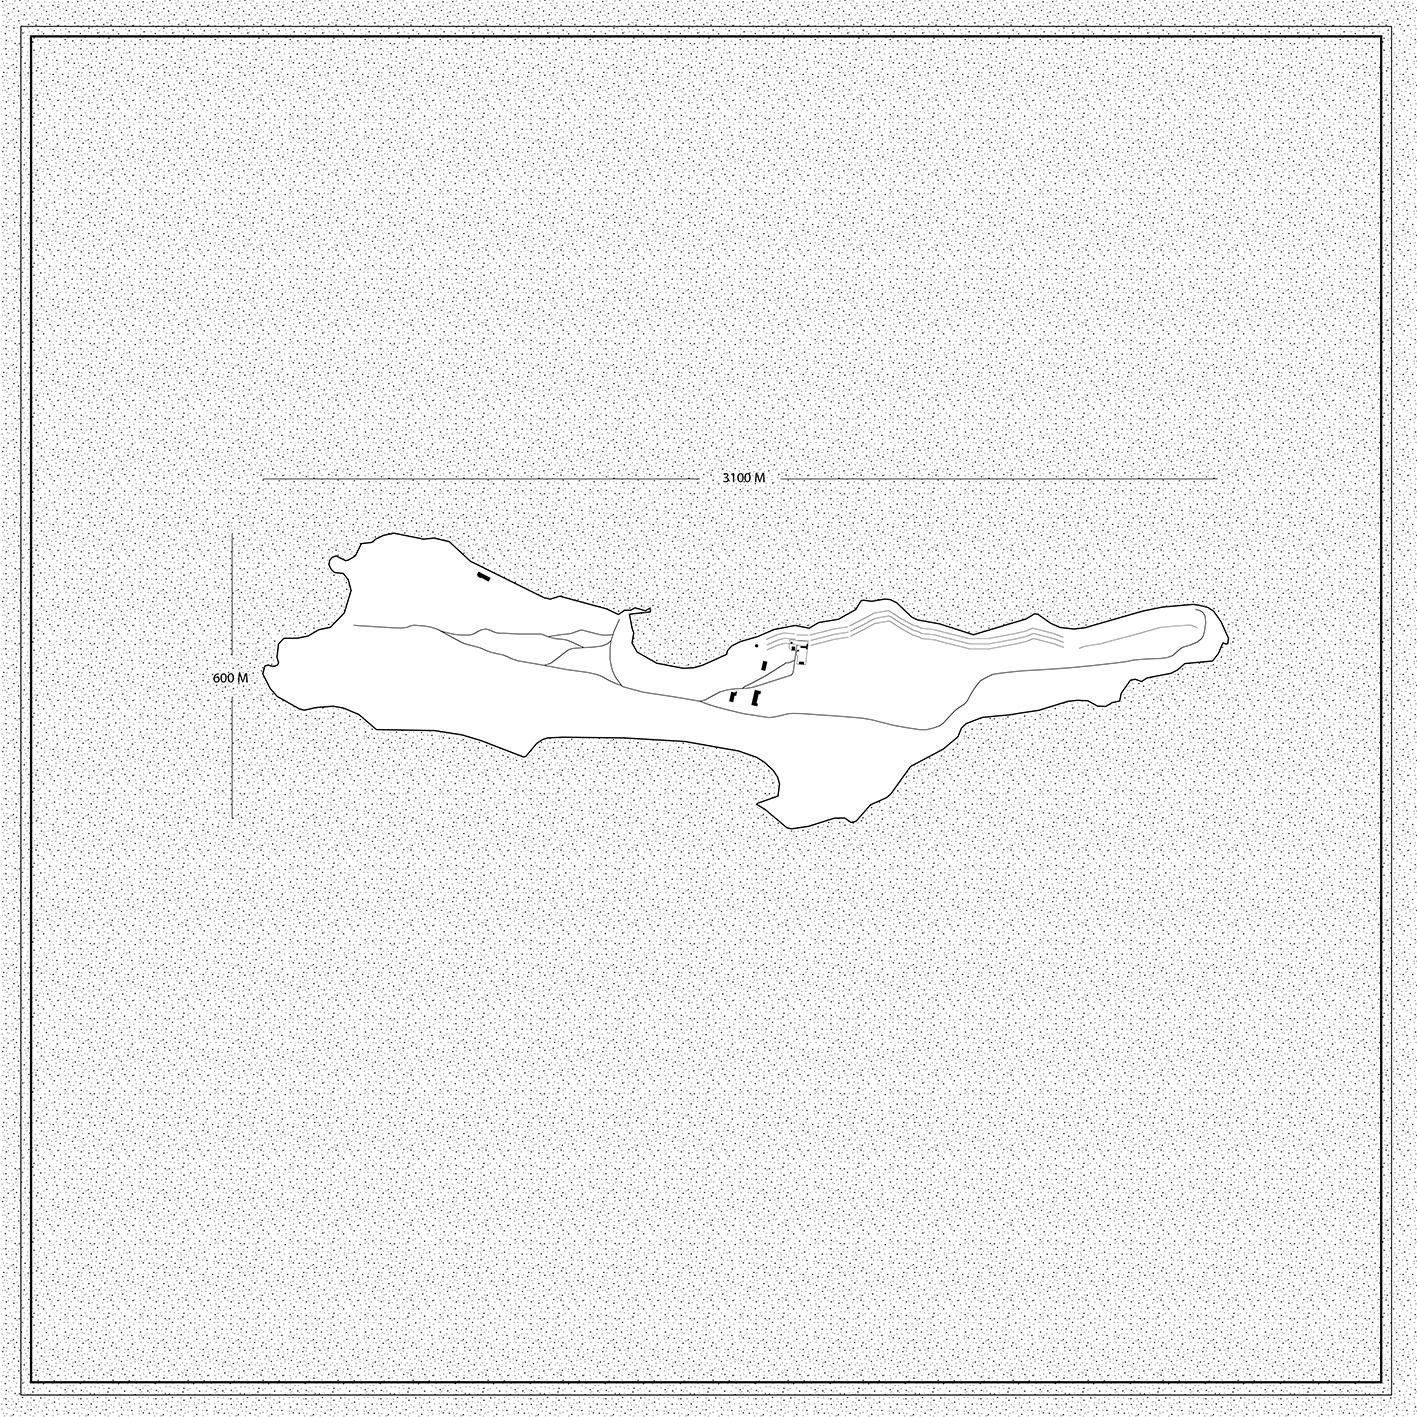 Buyuk_Zira_Plan-01.jpg